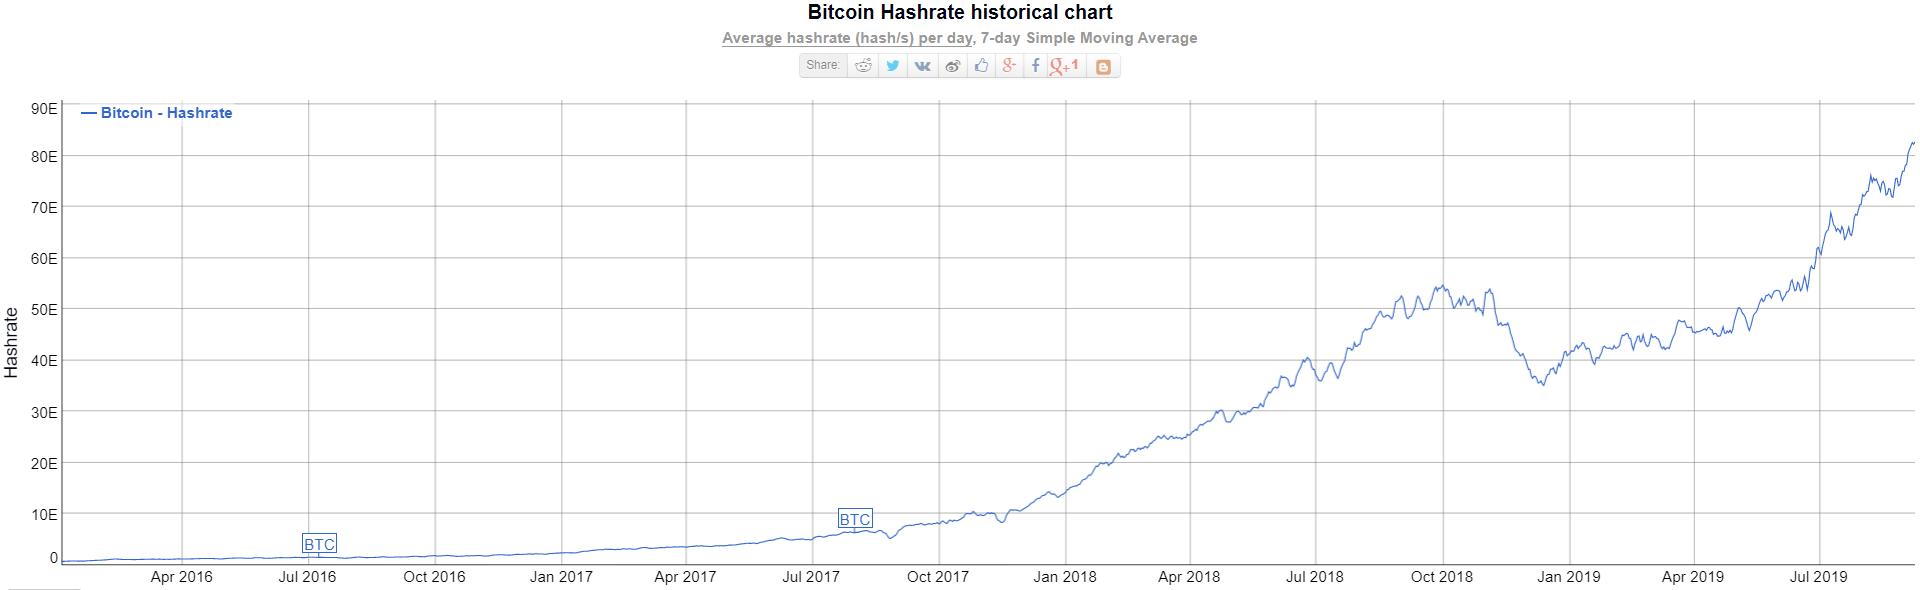 crypto, cryptocurrency, bitcoin, ethereum, blockchain, market, trading